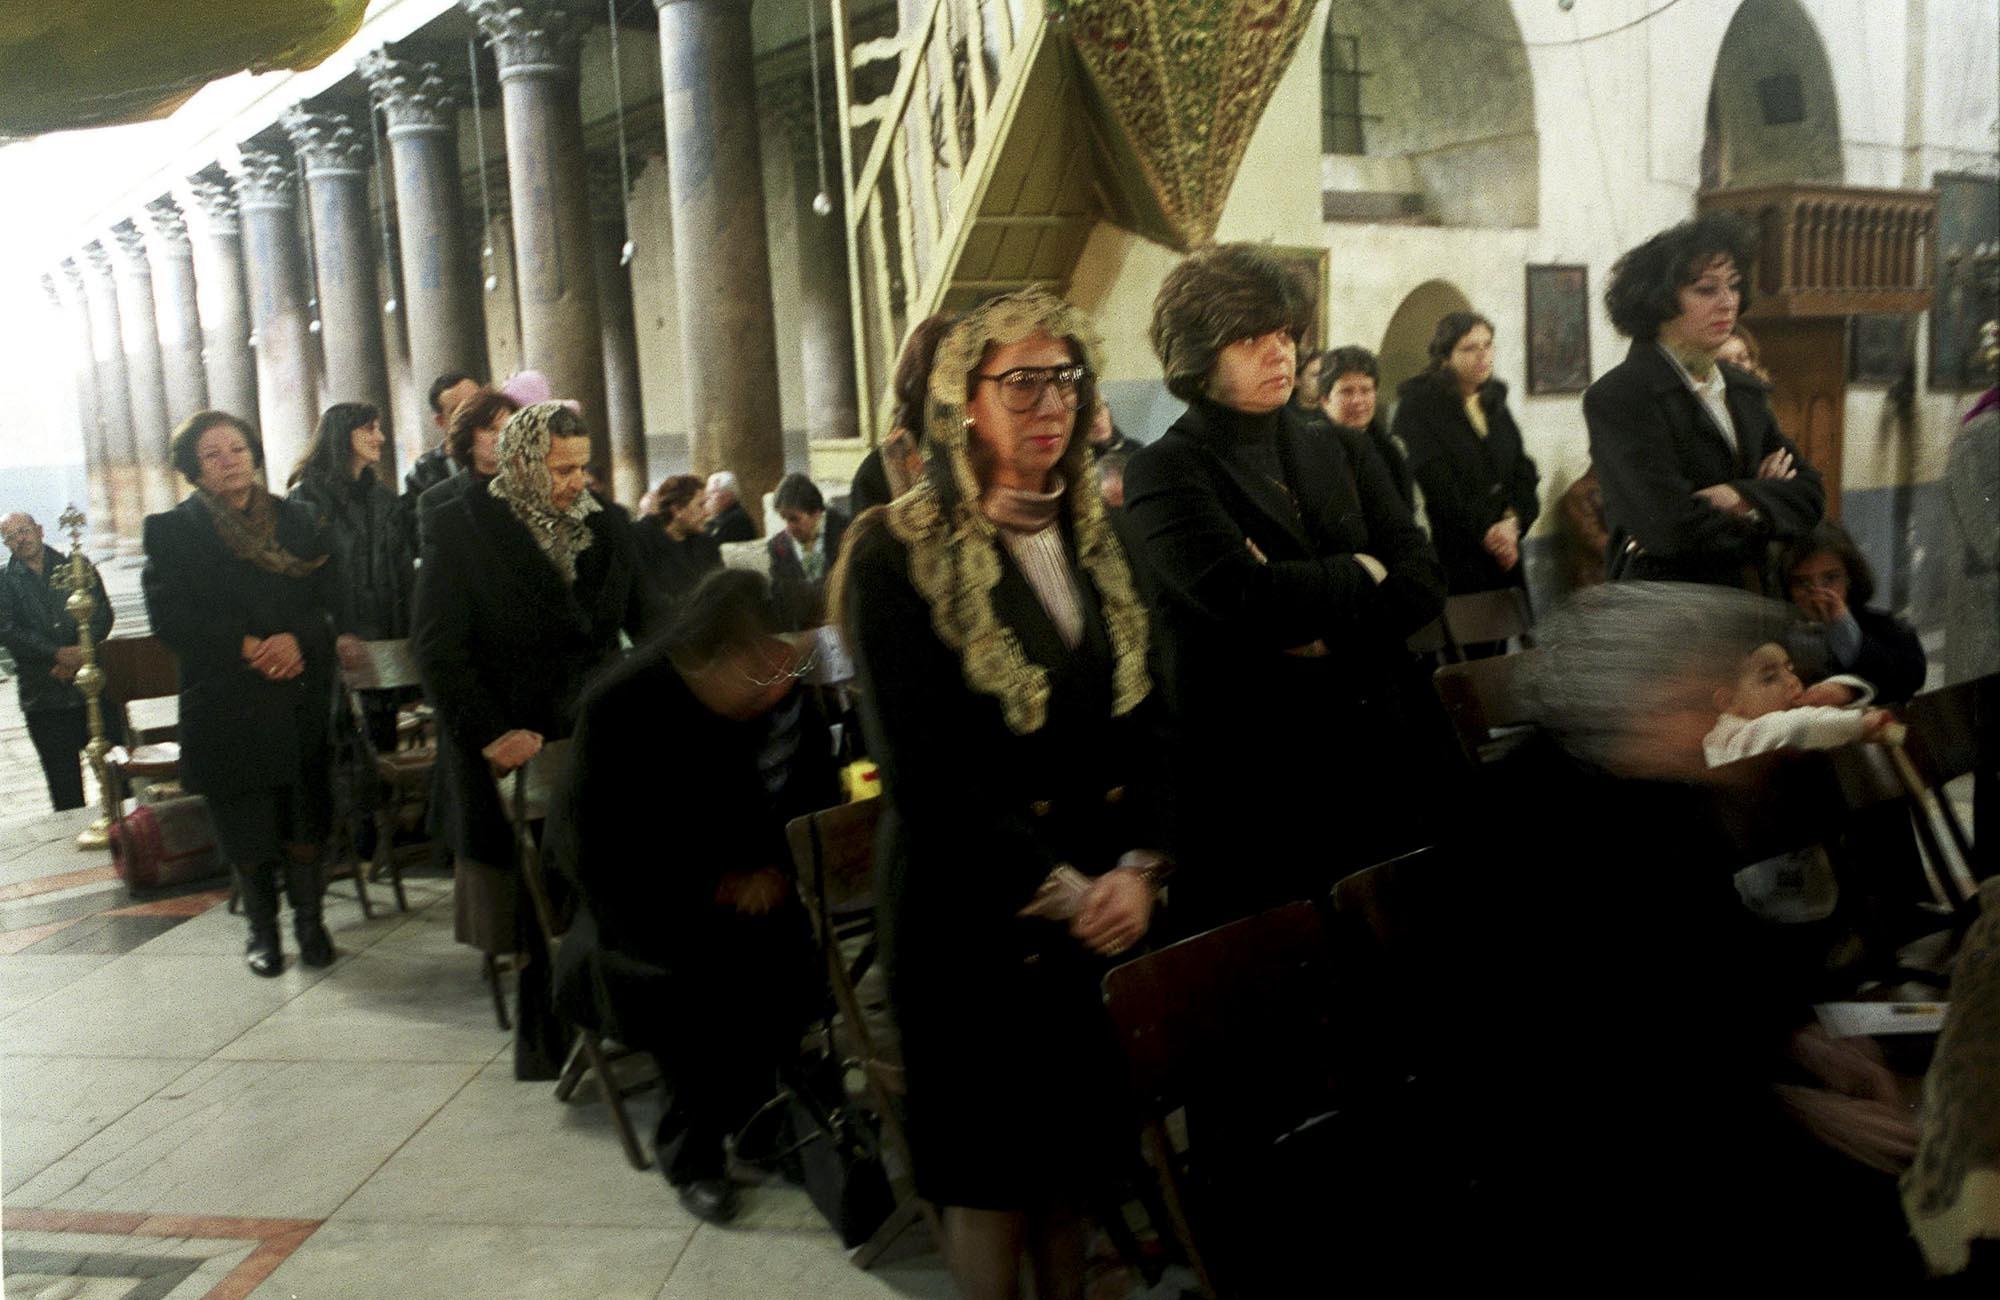 Greek Orthodox Mass in the Church of the Nativity, Bethleem 2002